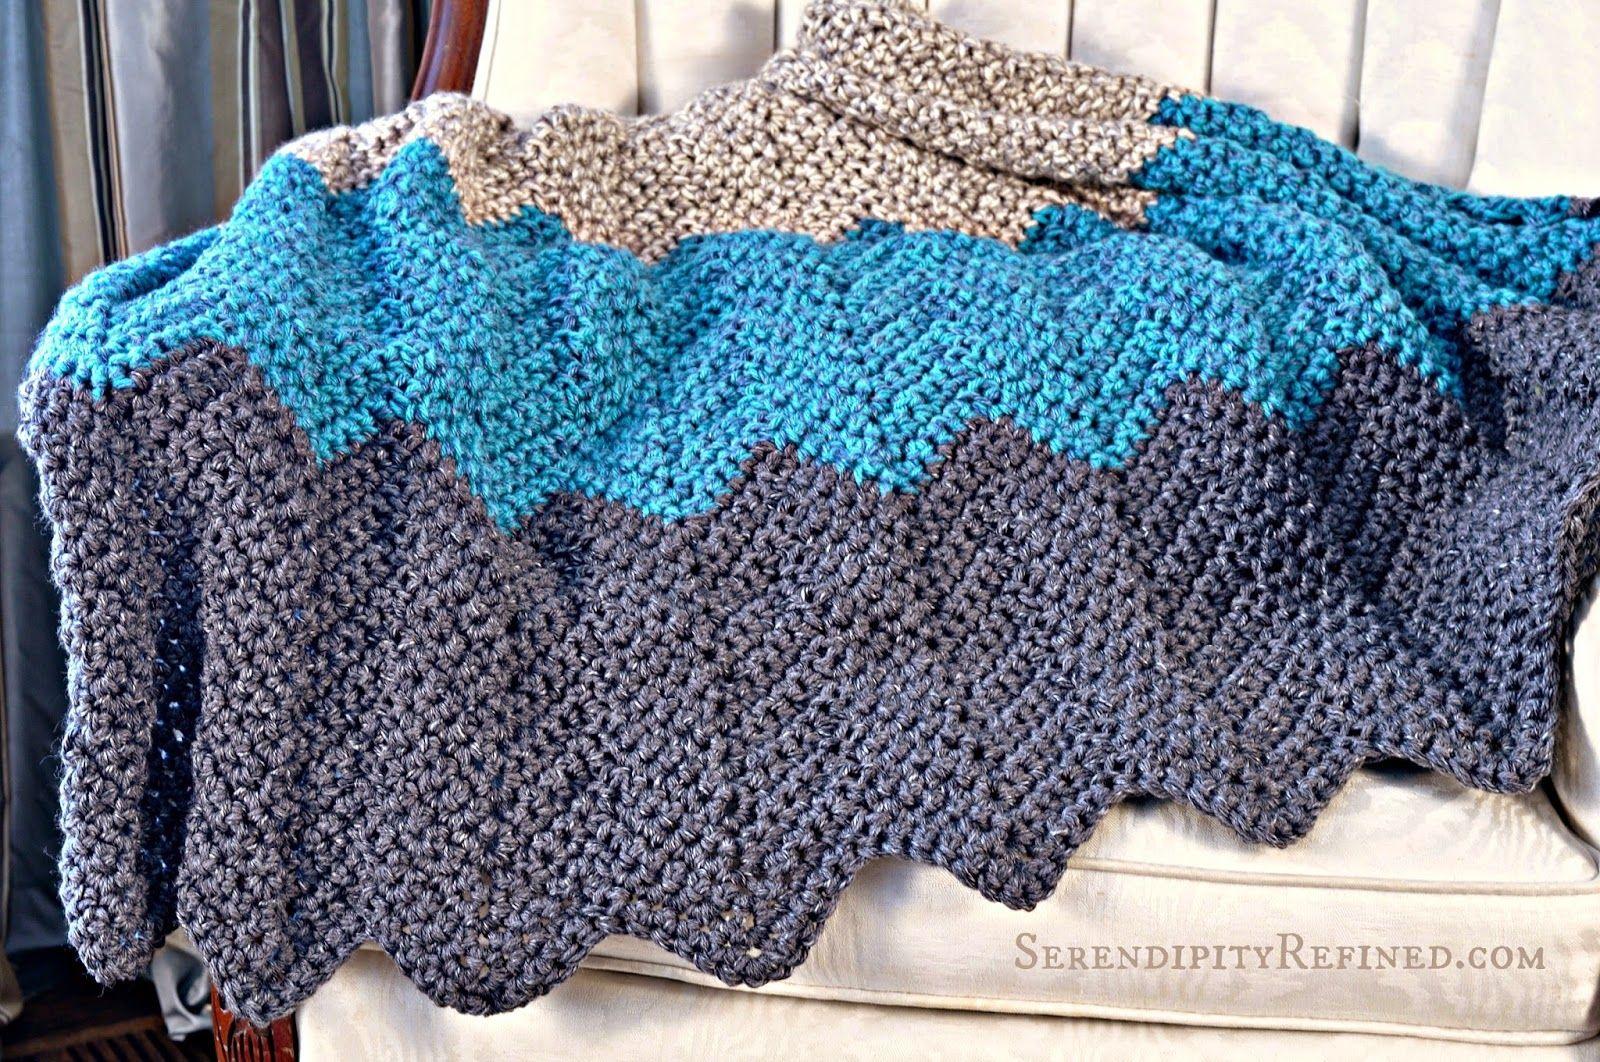 Serendipity Refined Blog: Easy Crochet Throw Blanket Pattern ...